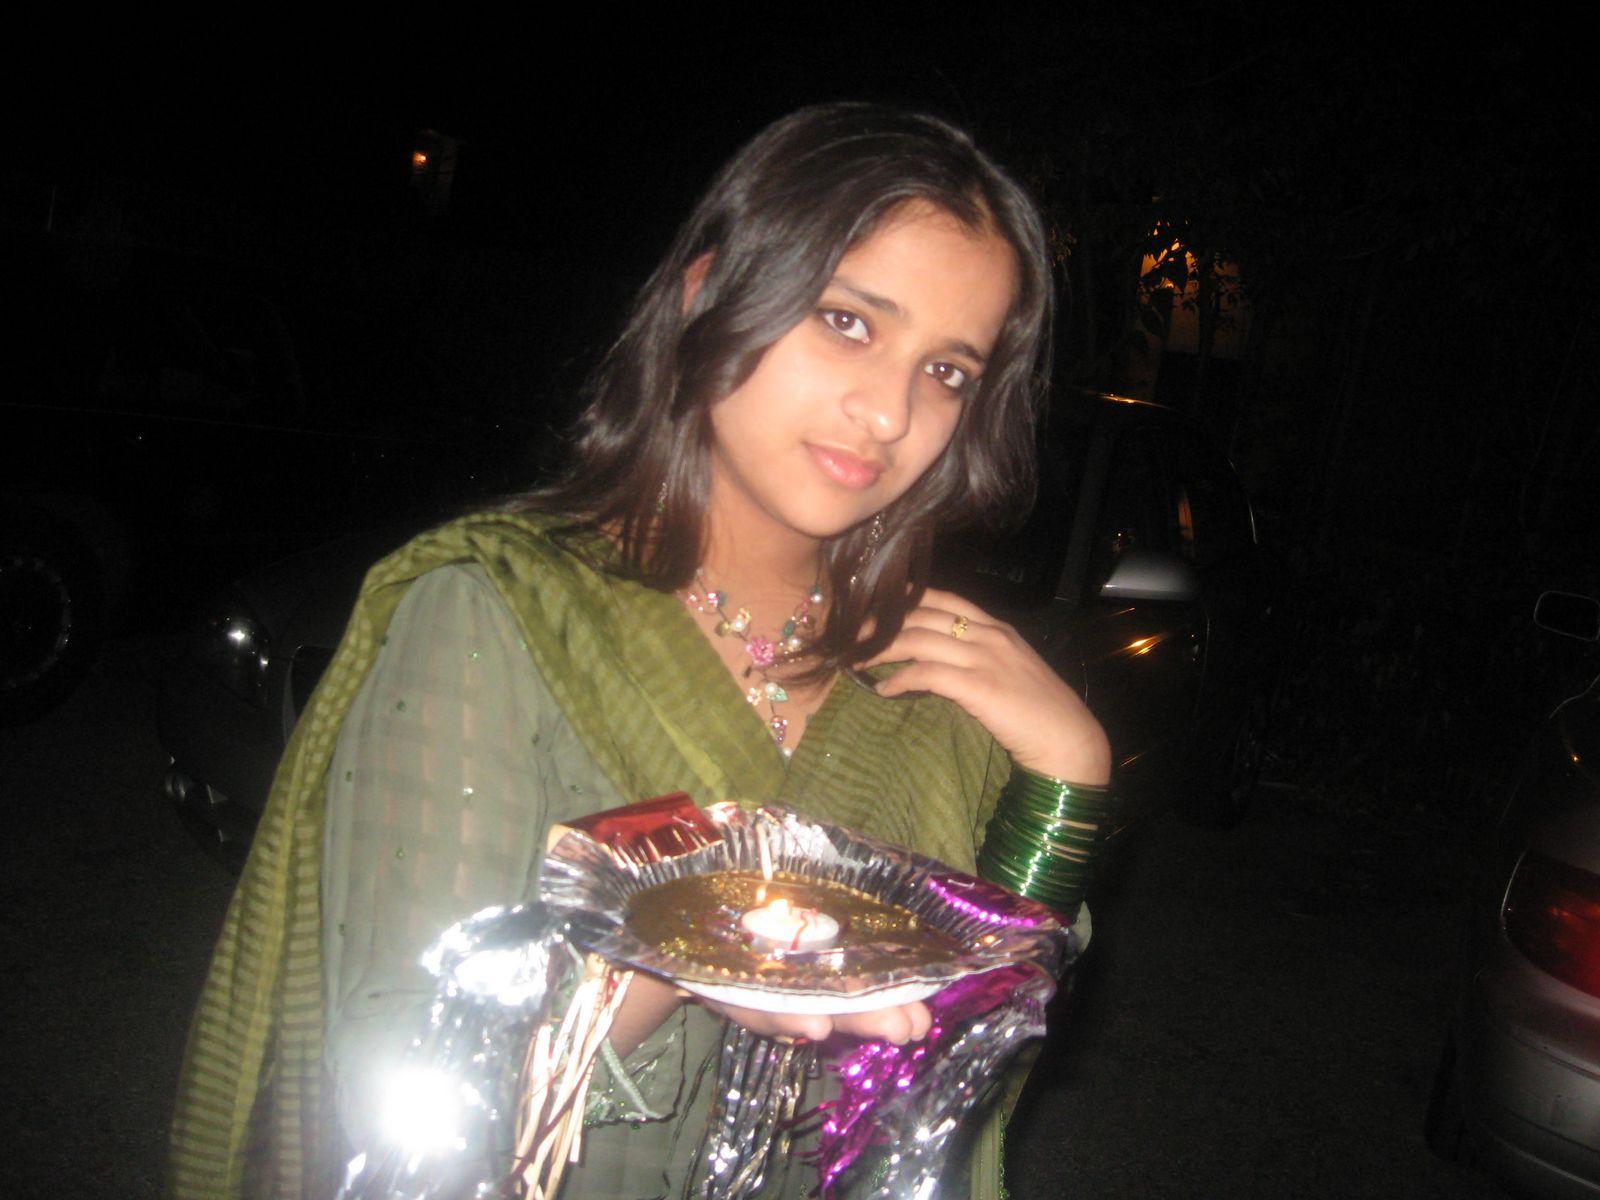 http://1.bp.blogspot.com/-YEAyRfO-Nyg/TkoHgT3d4KI/AAAAAAAAAcY/7pm6ZtFN9c0/s1600/Pakistani+wows+Wallpaper.jpg